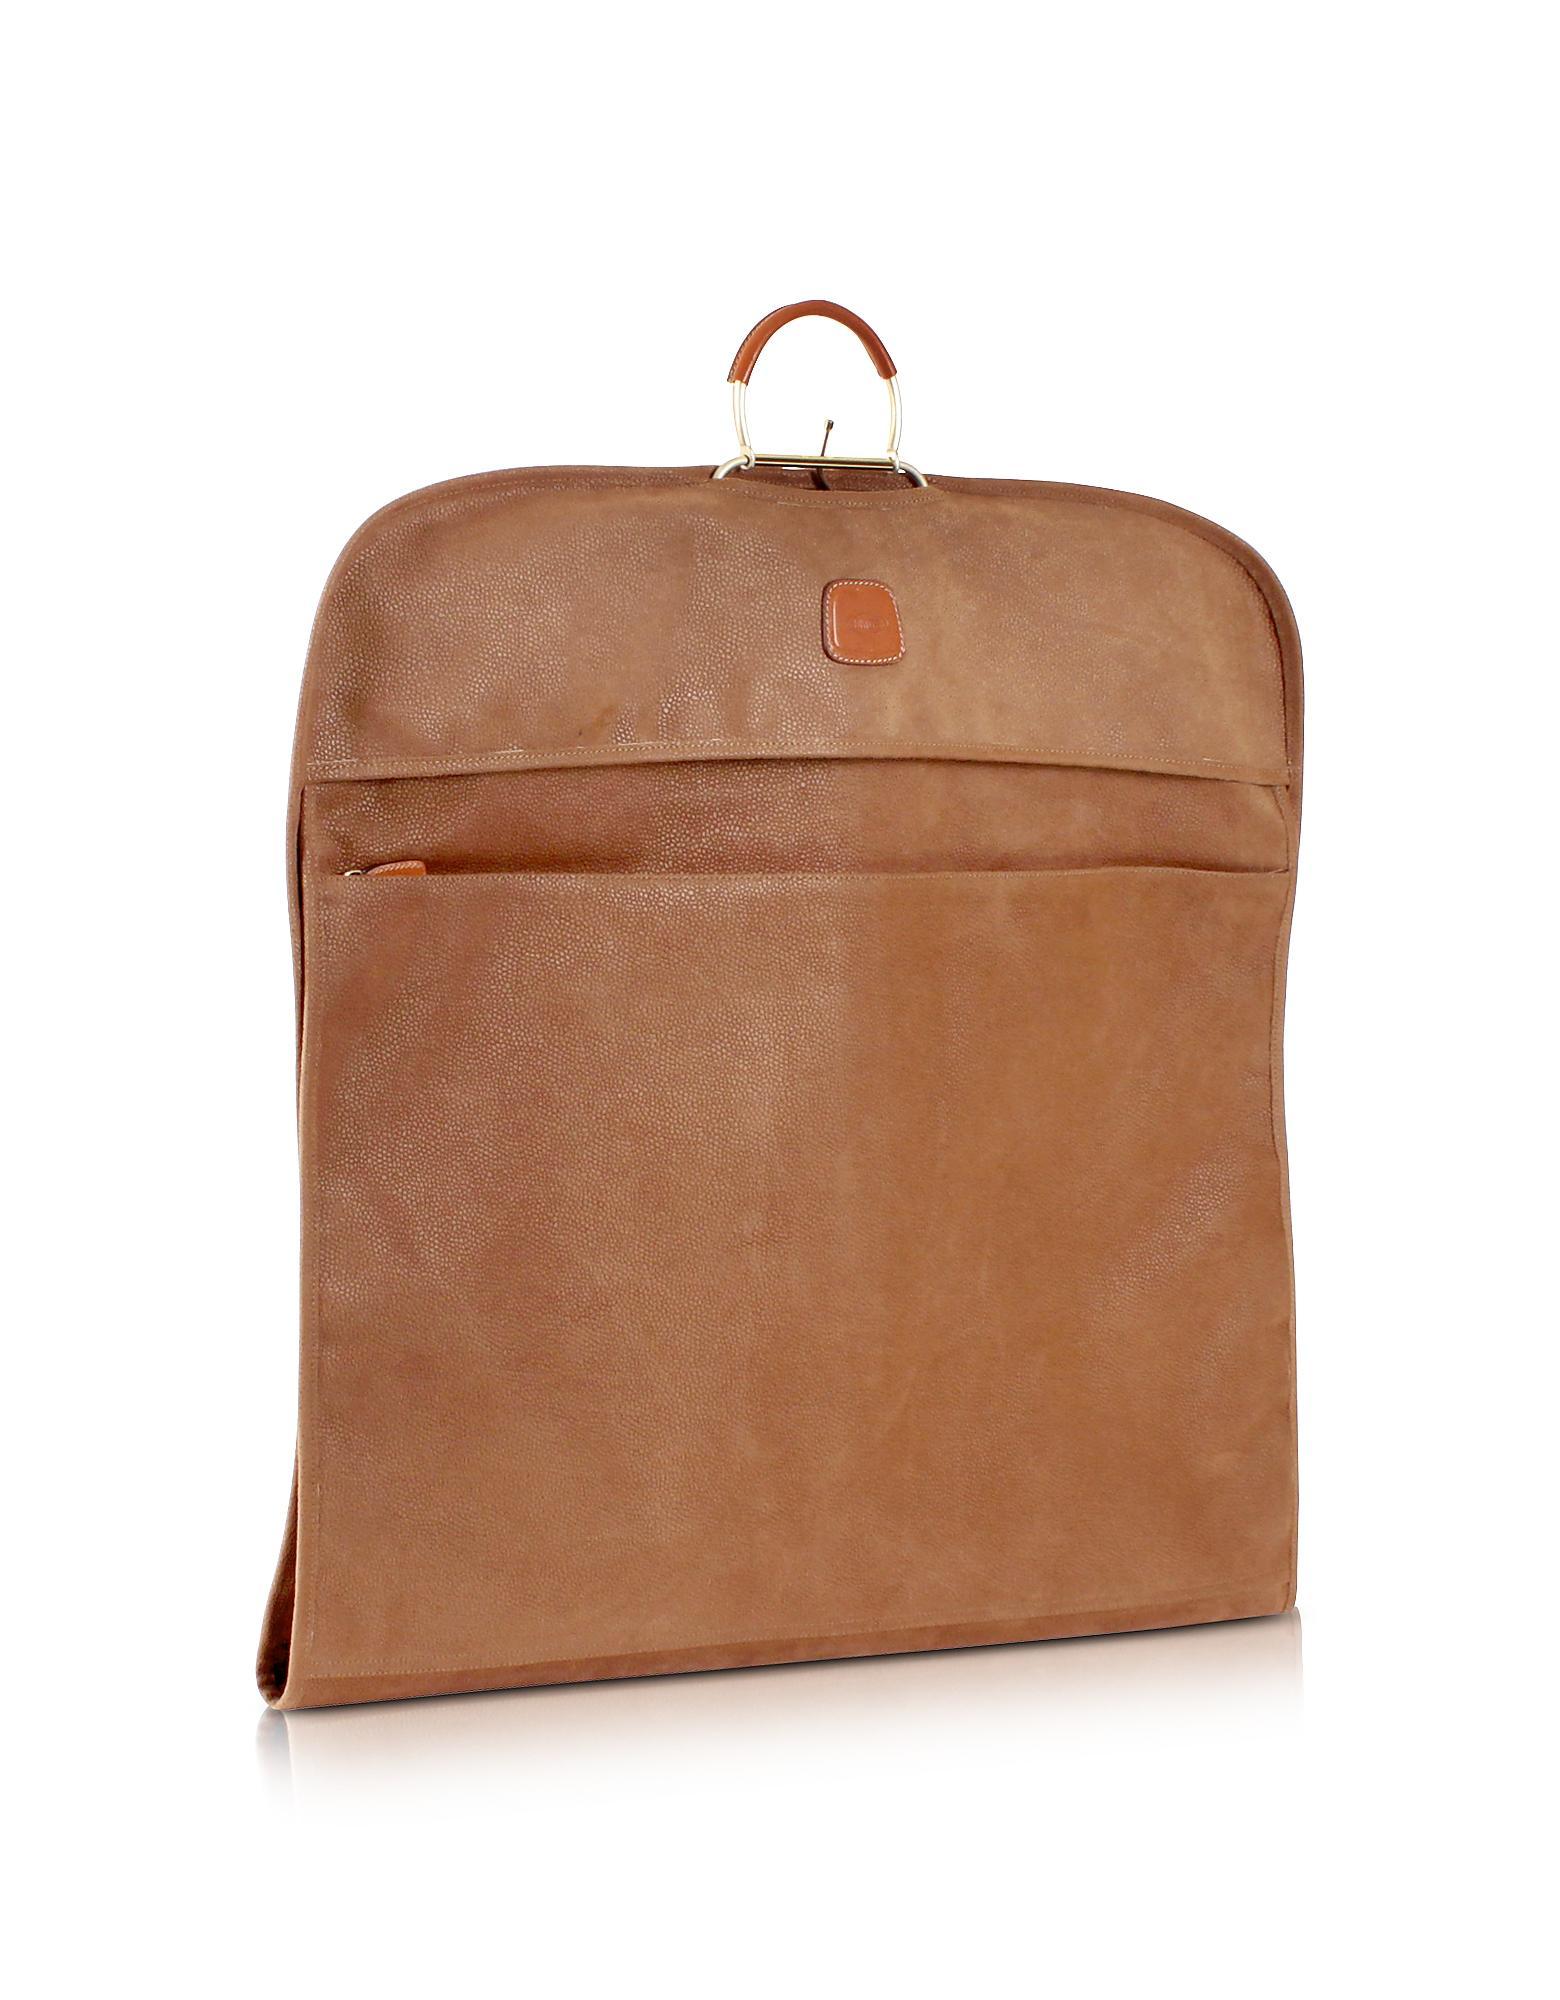 Bric's Travel Bags, Life Camel Micro-Suede Garment Bag